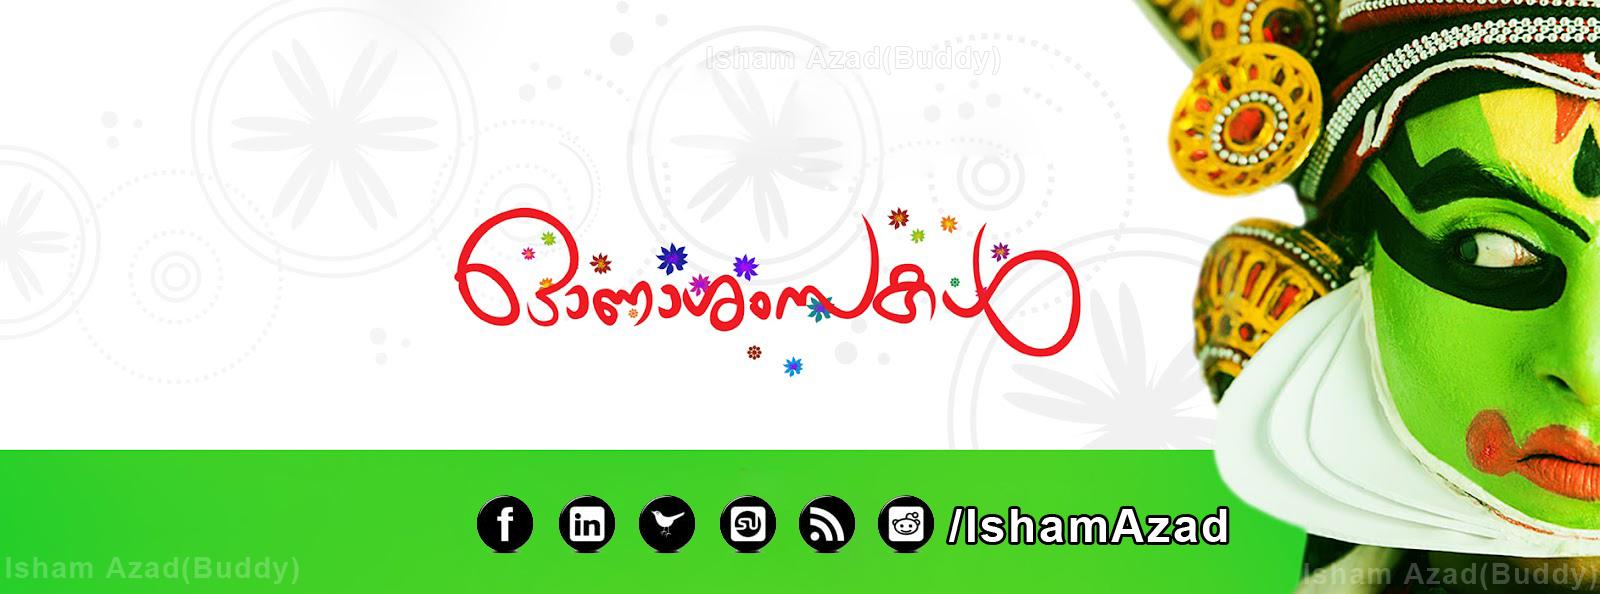 Happy Onam To All My Buddies - Happy Onam PNG